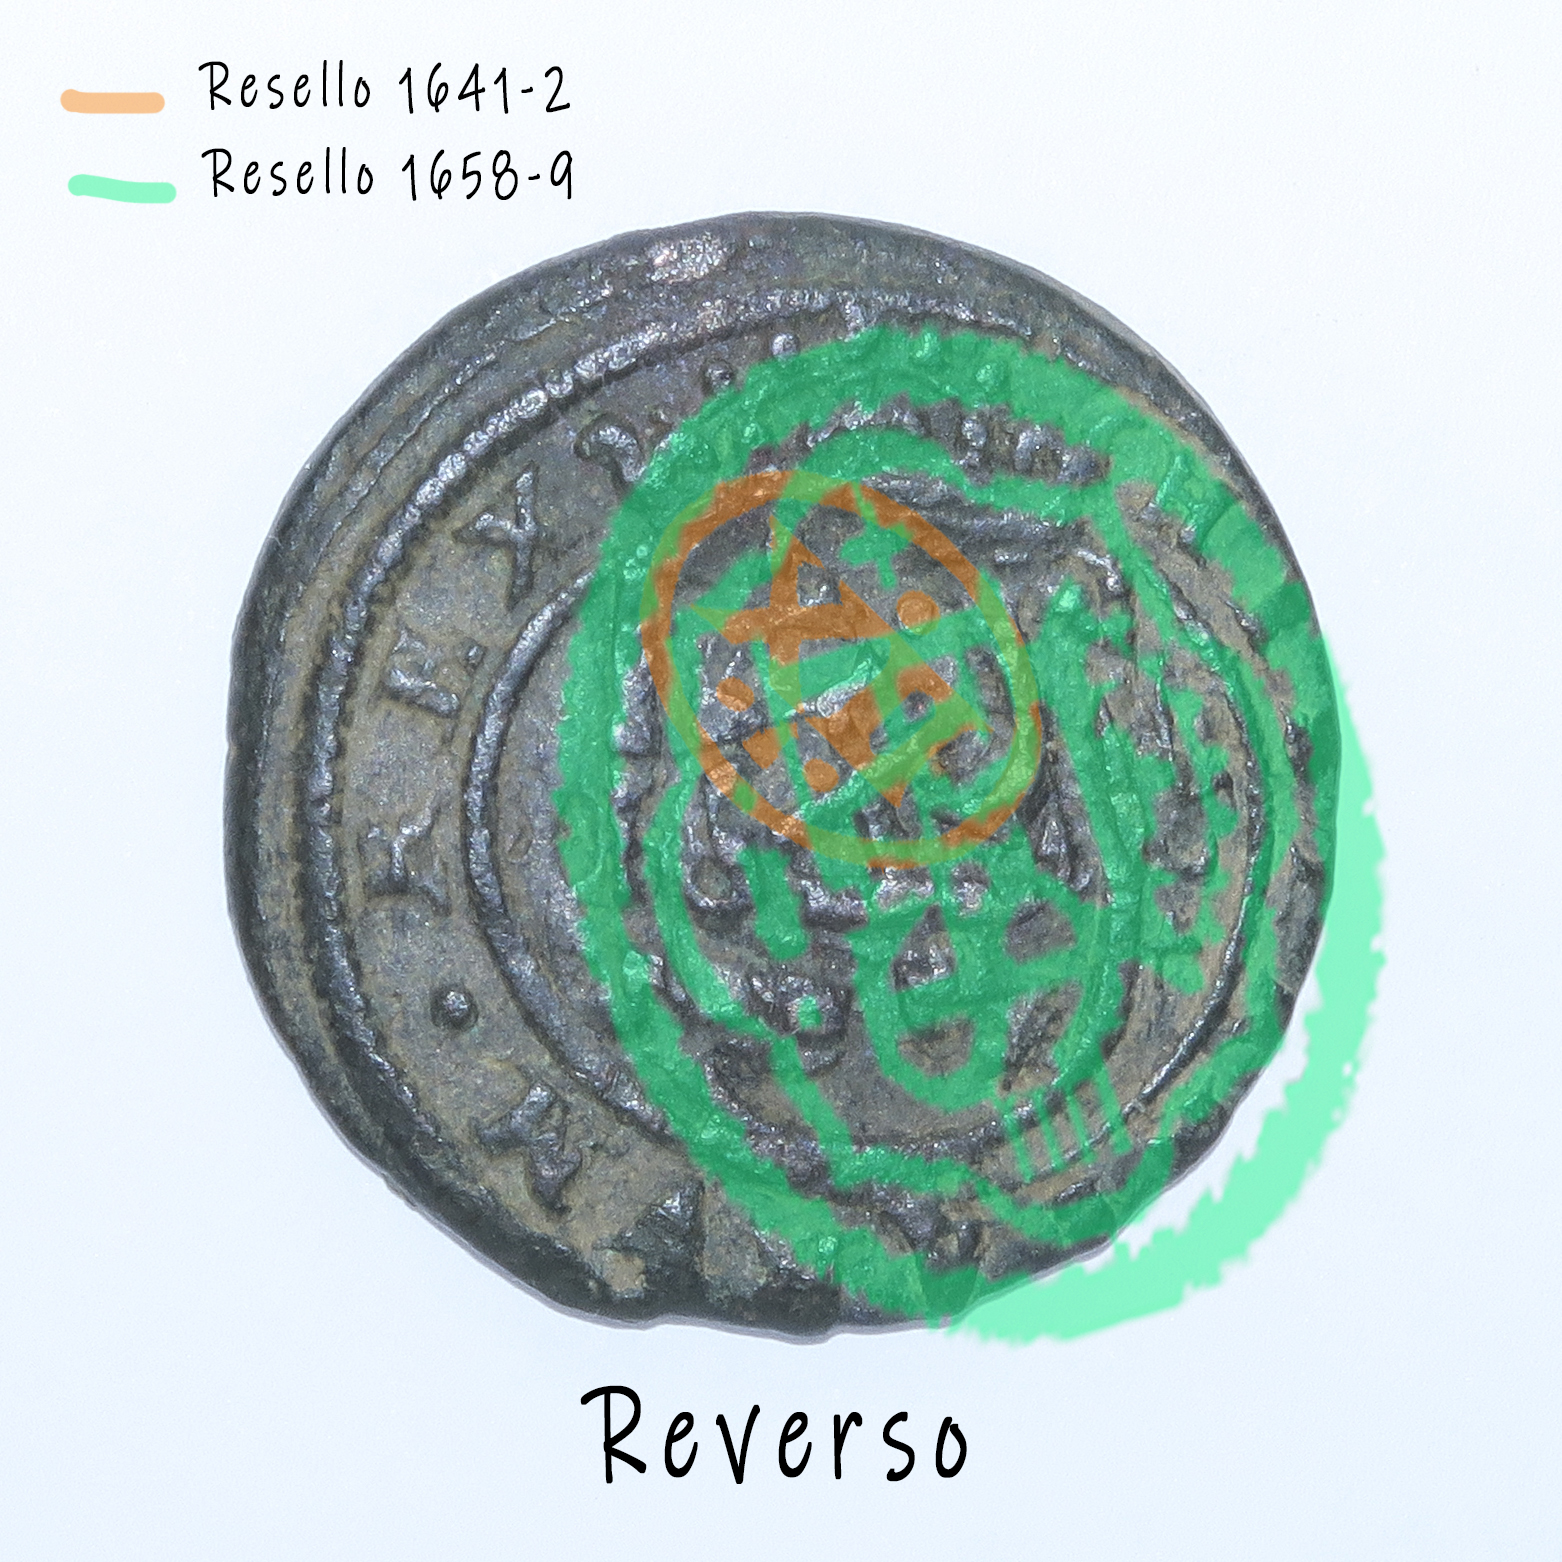 8 Maravedis 1614 e Felipe III de 1614 (ceca Segovia) resellados Revers12